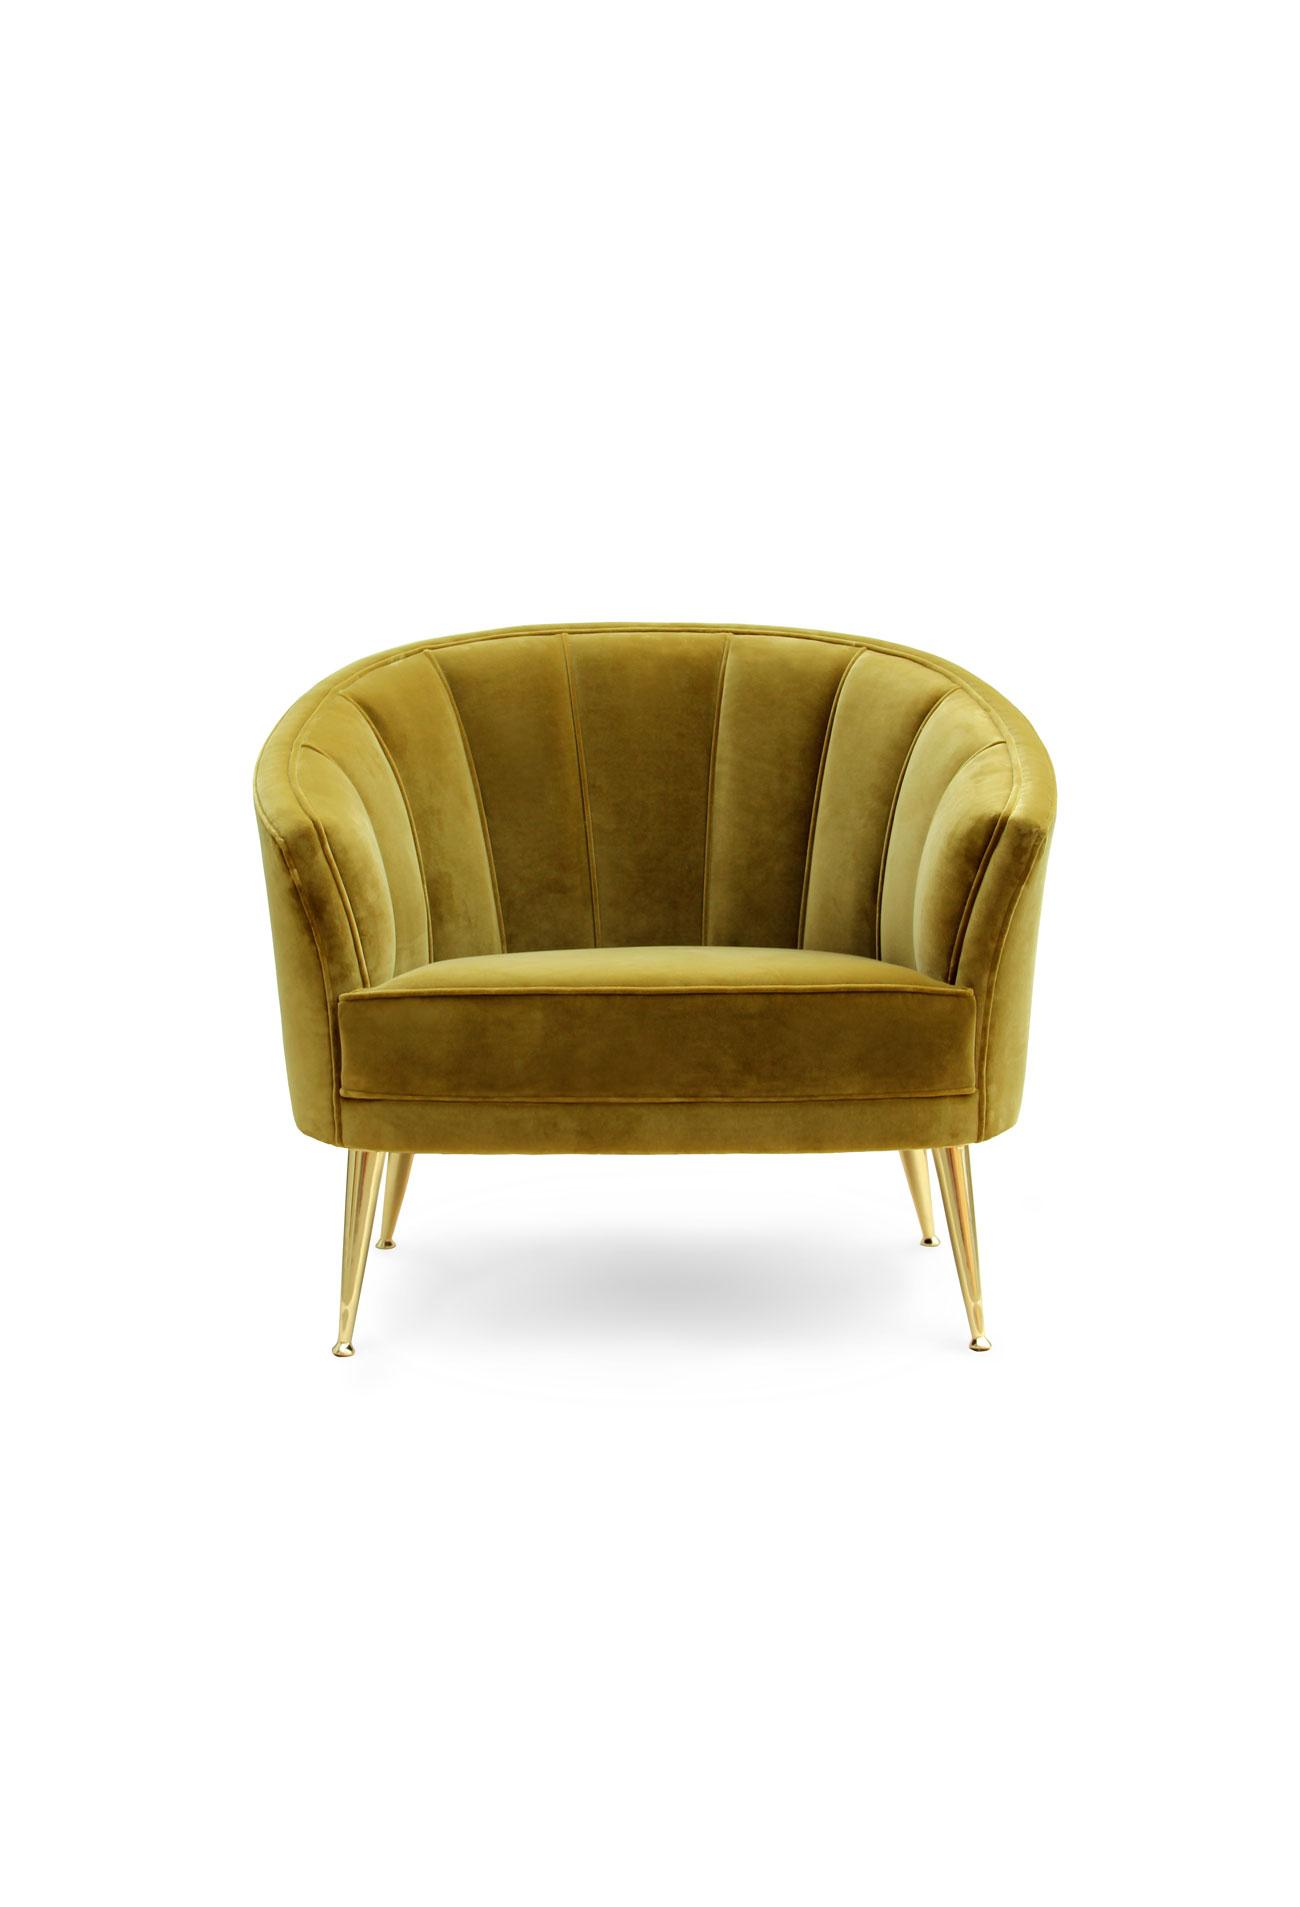 Beau Mid Century Club Chair 8